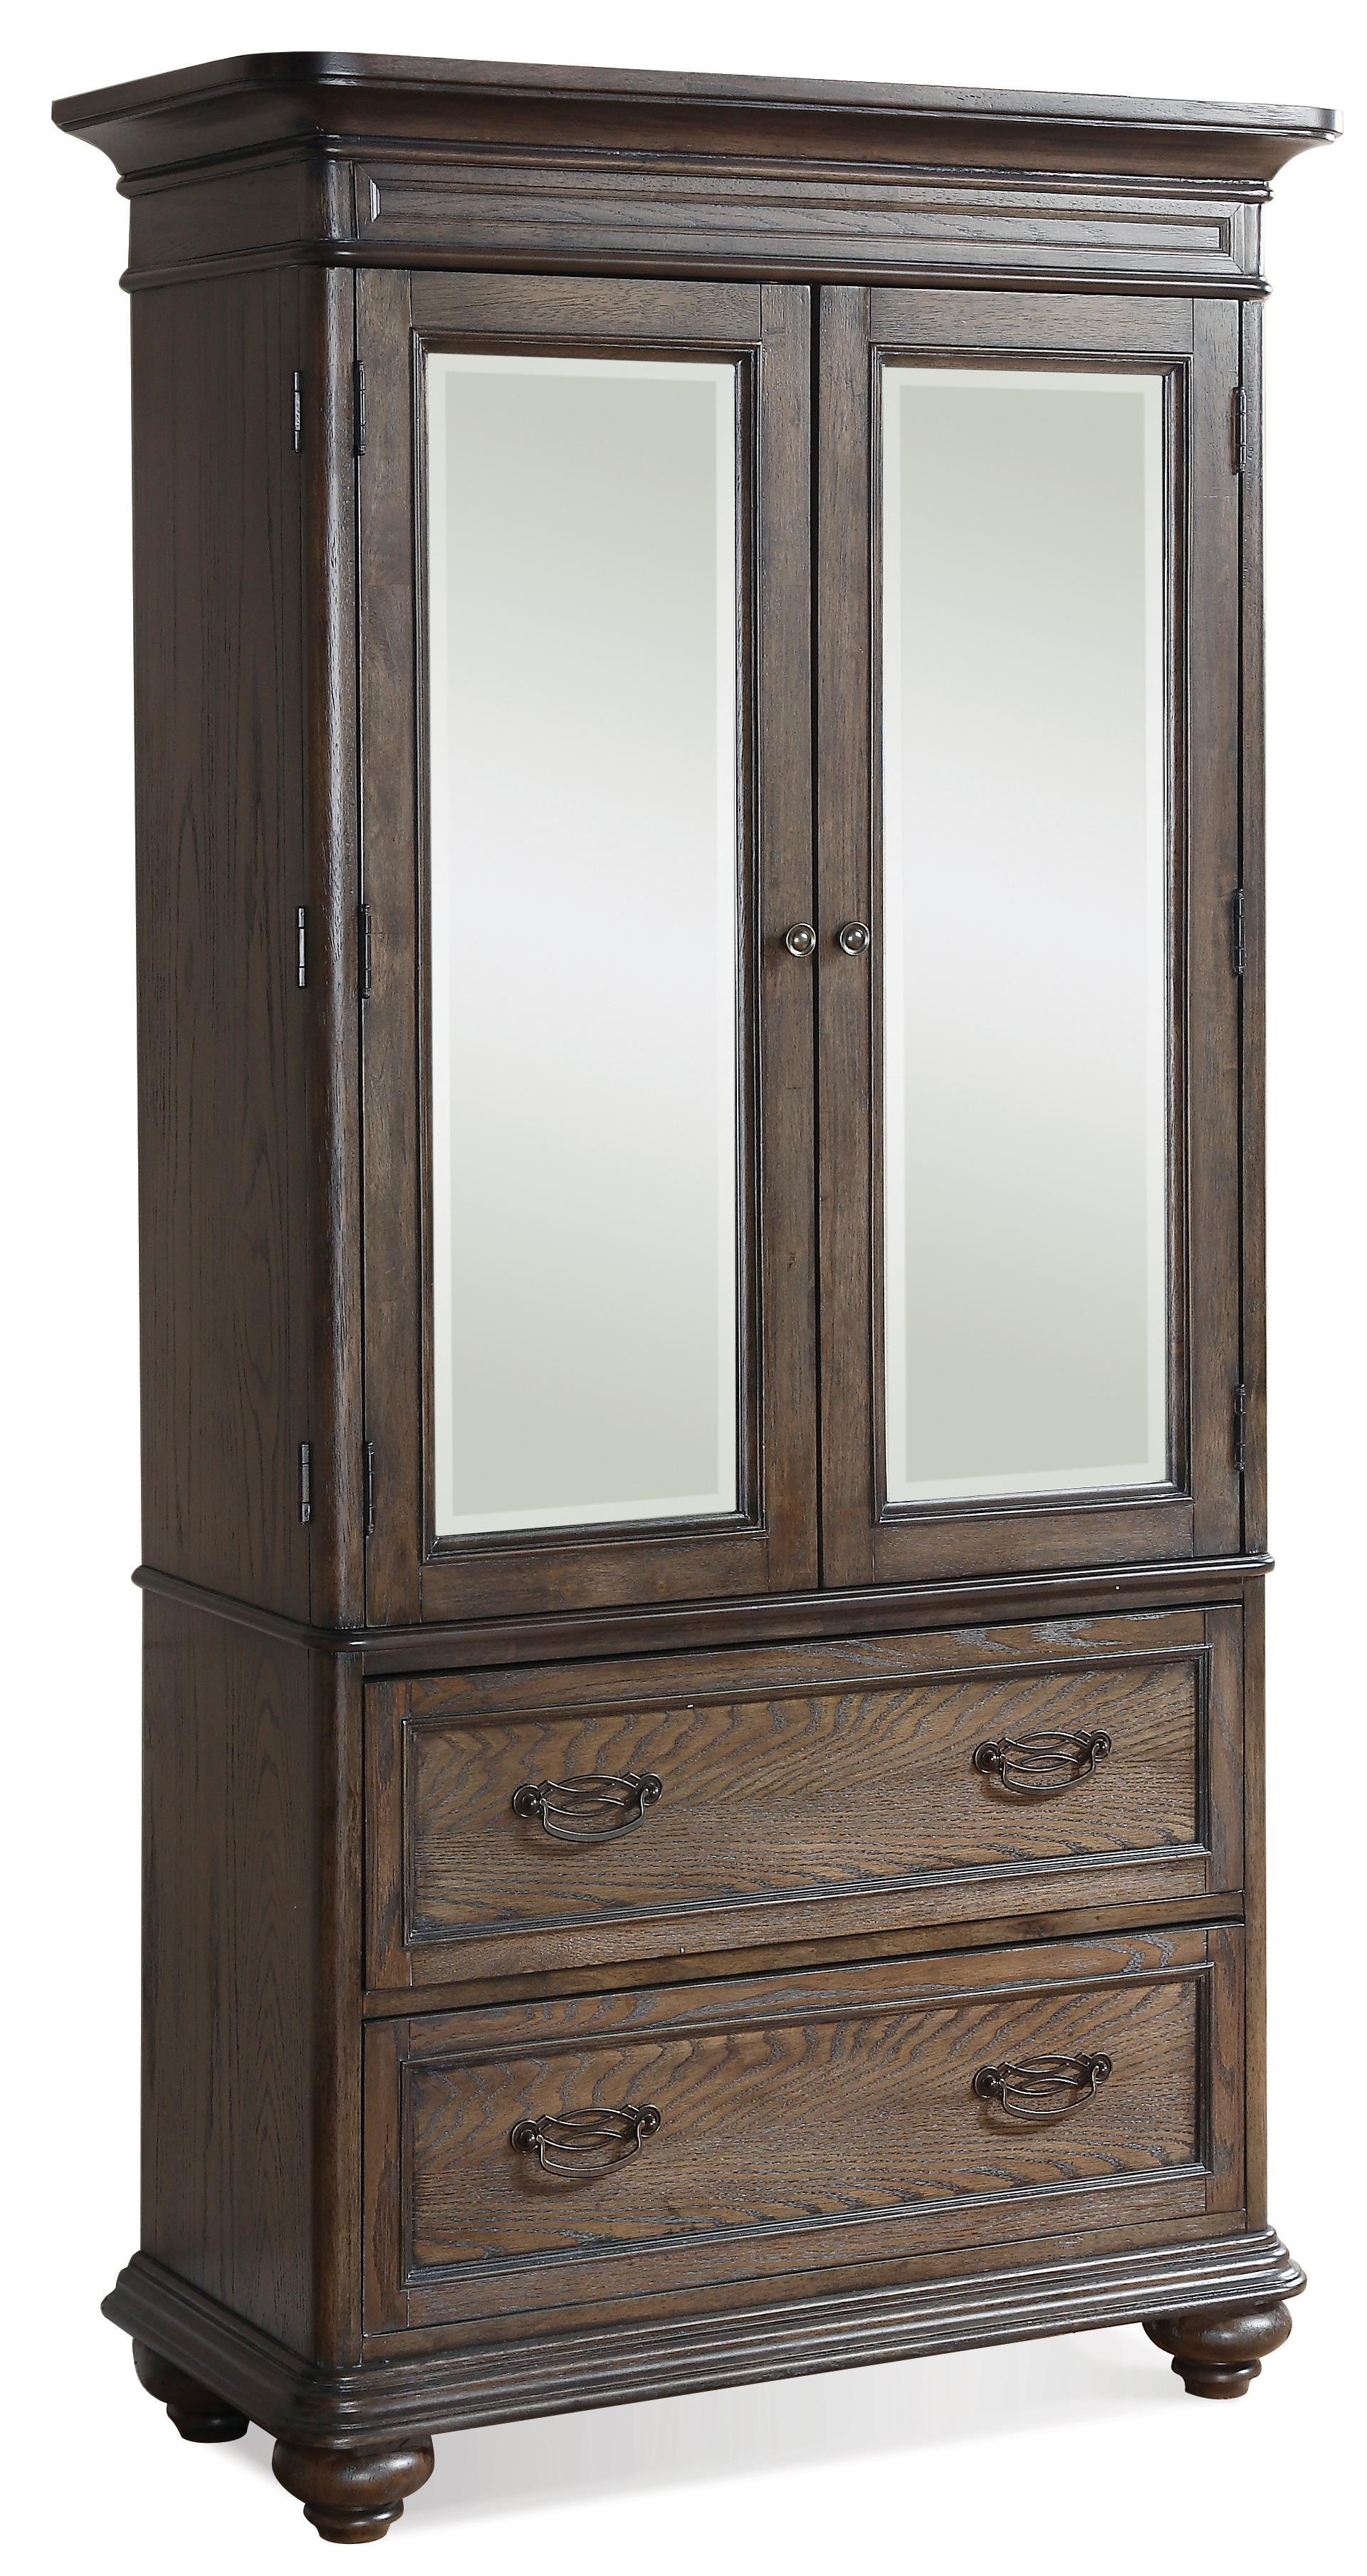 riverside furniture belmeade 15866 two door armoire w. Black Bedroom Furniture Sets. Home Design Ideas